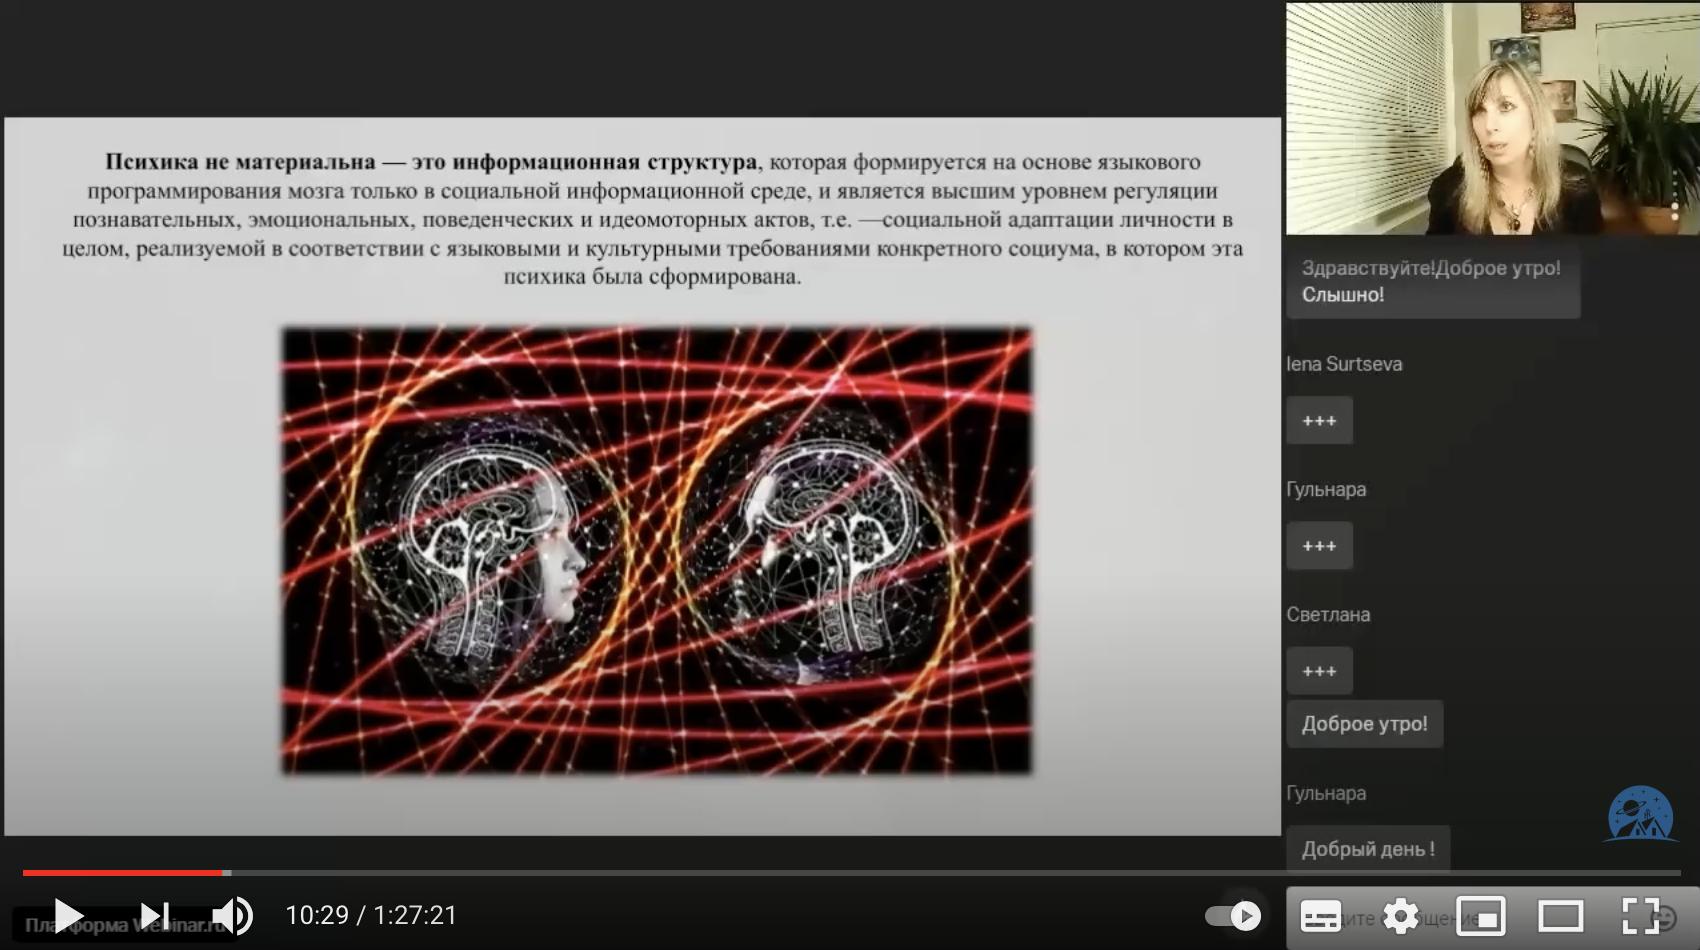 https://astrologtasha.ru/wp-content/uploads/2021/04/Screen-Shot-2021-04-13-at-11.40.38-PM.png